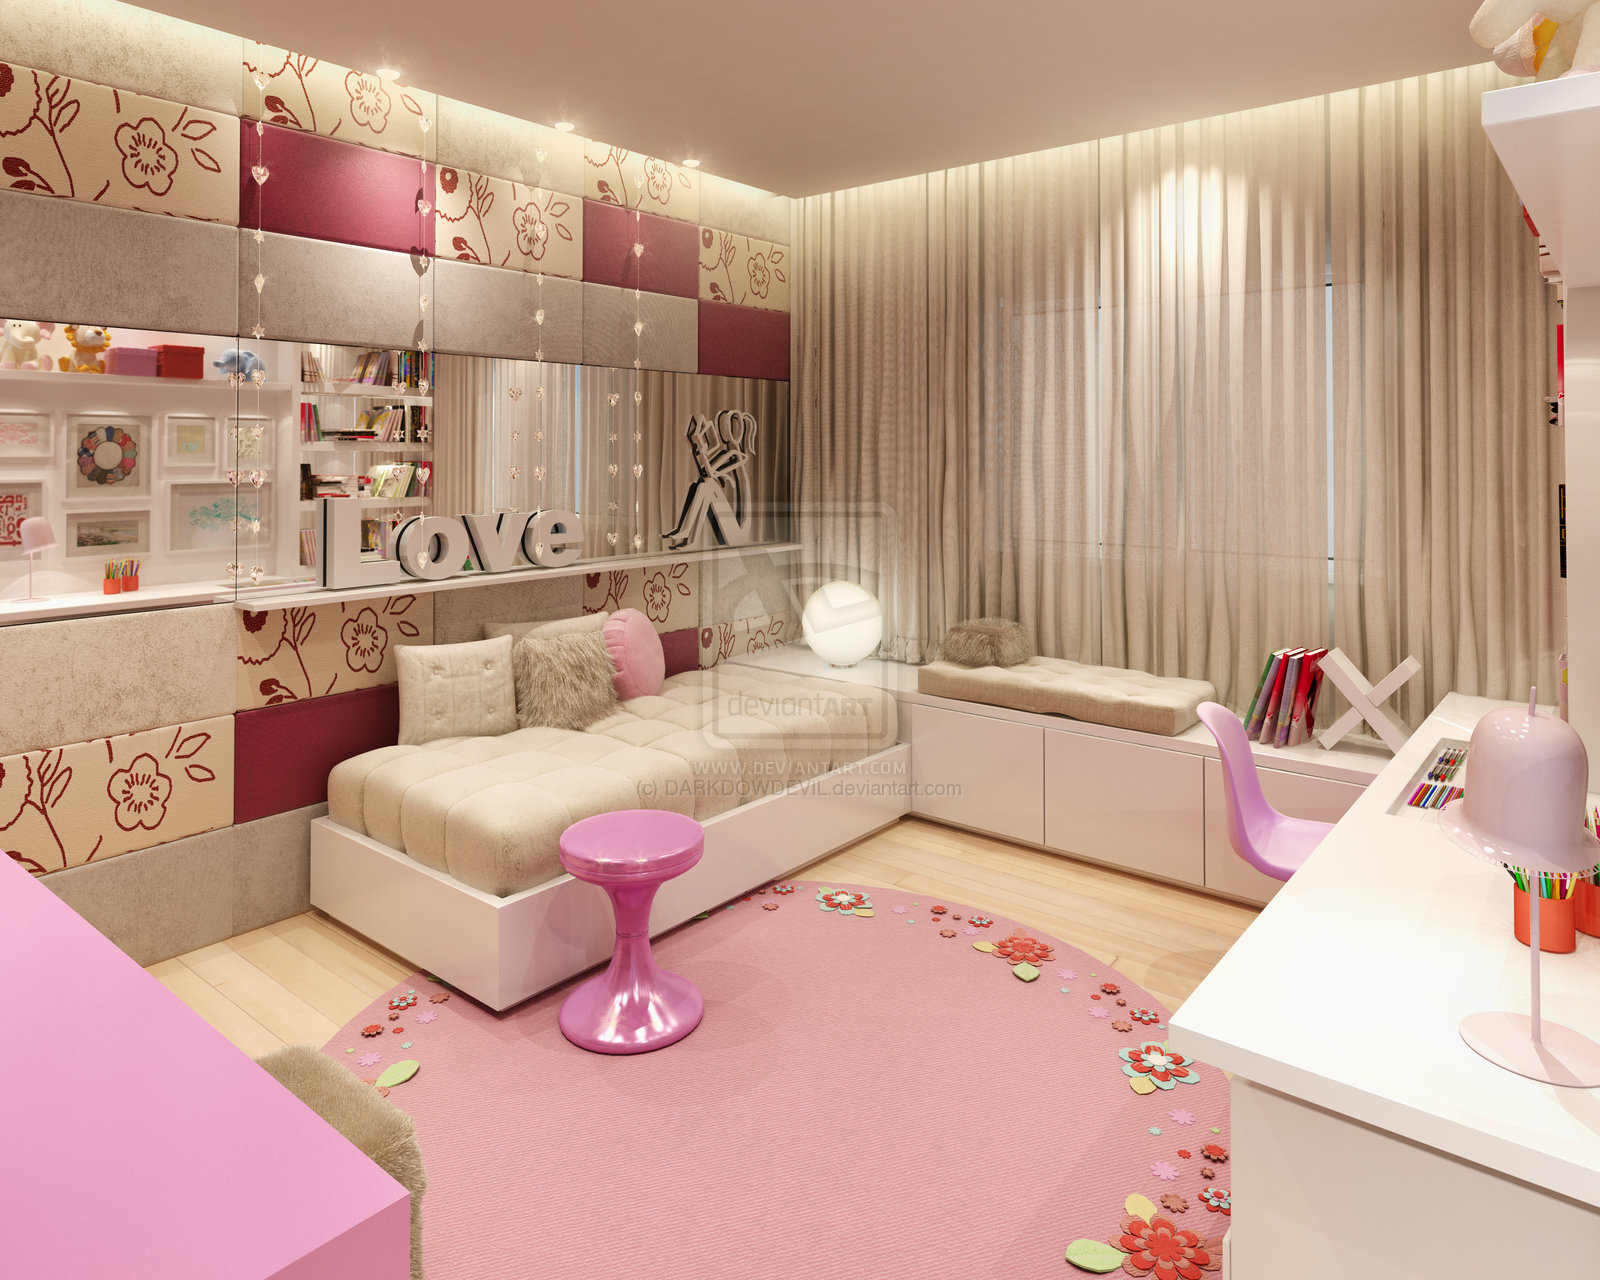 Girly Bedroom Design Ideas - Wonderful on Pretty Room Decor For Girl  id=63487